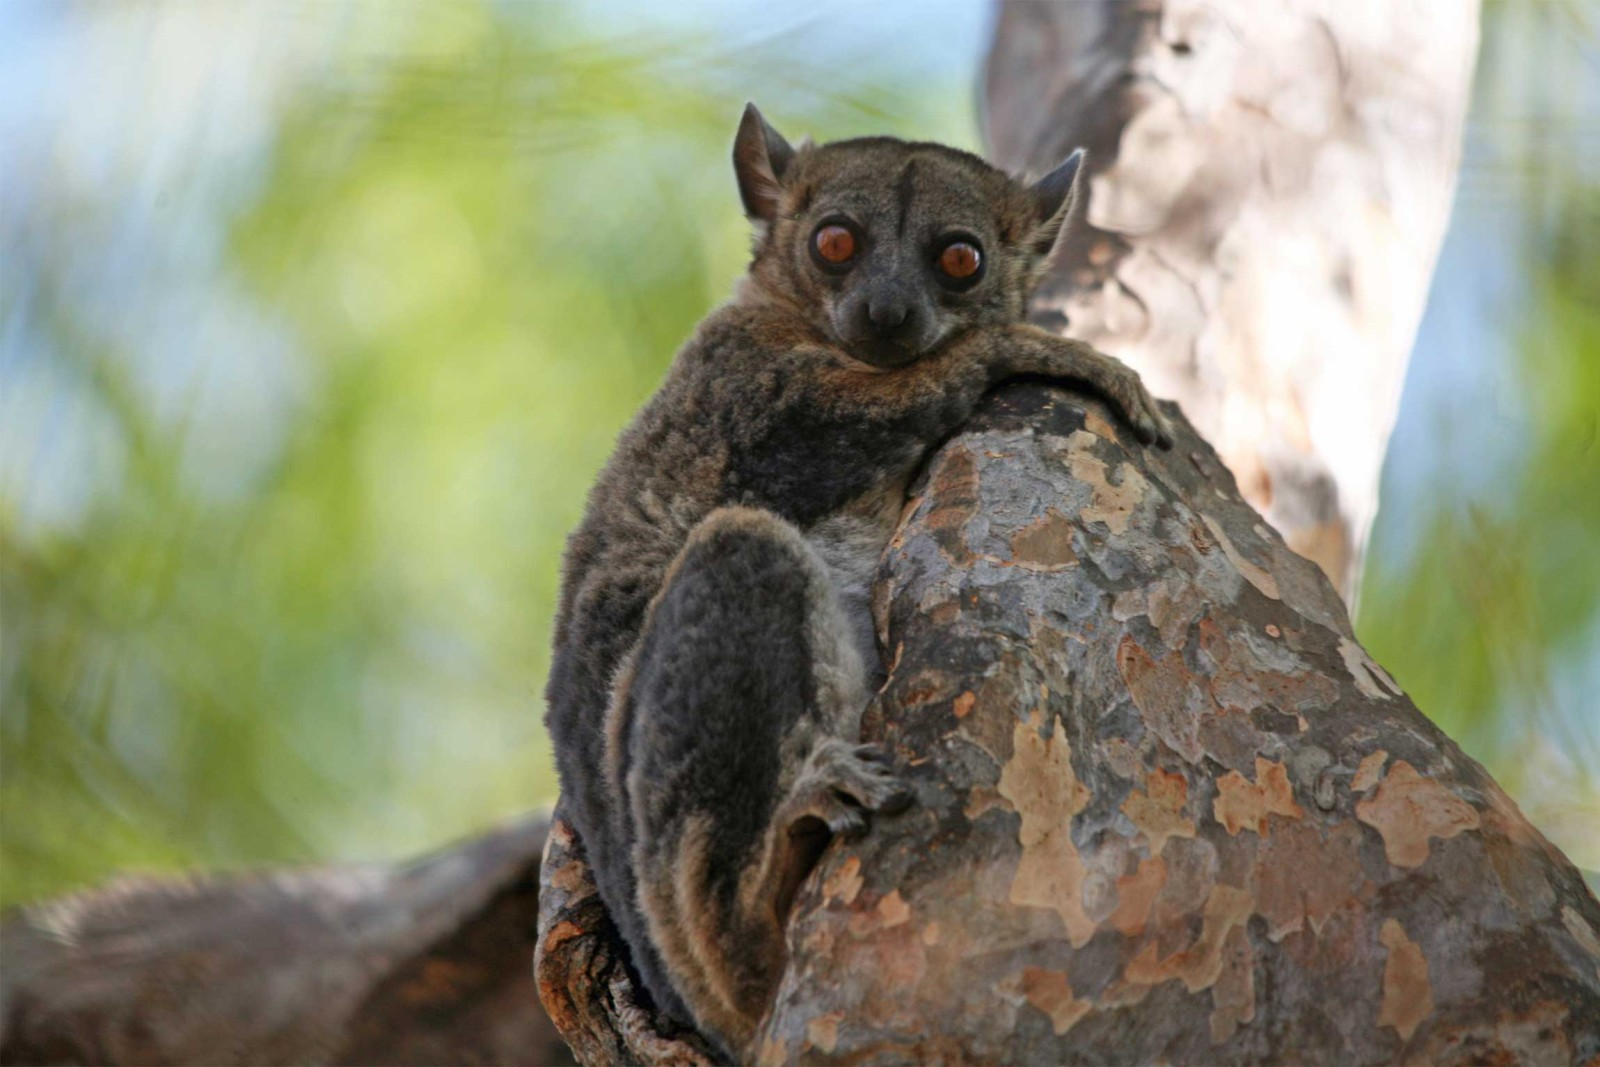 Madagascar-Tours-western-Madagascar_red-tailed-sportive-lemur